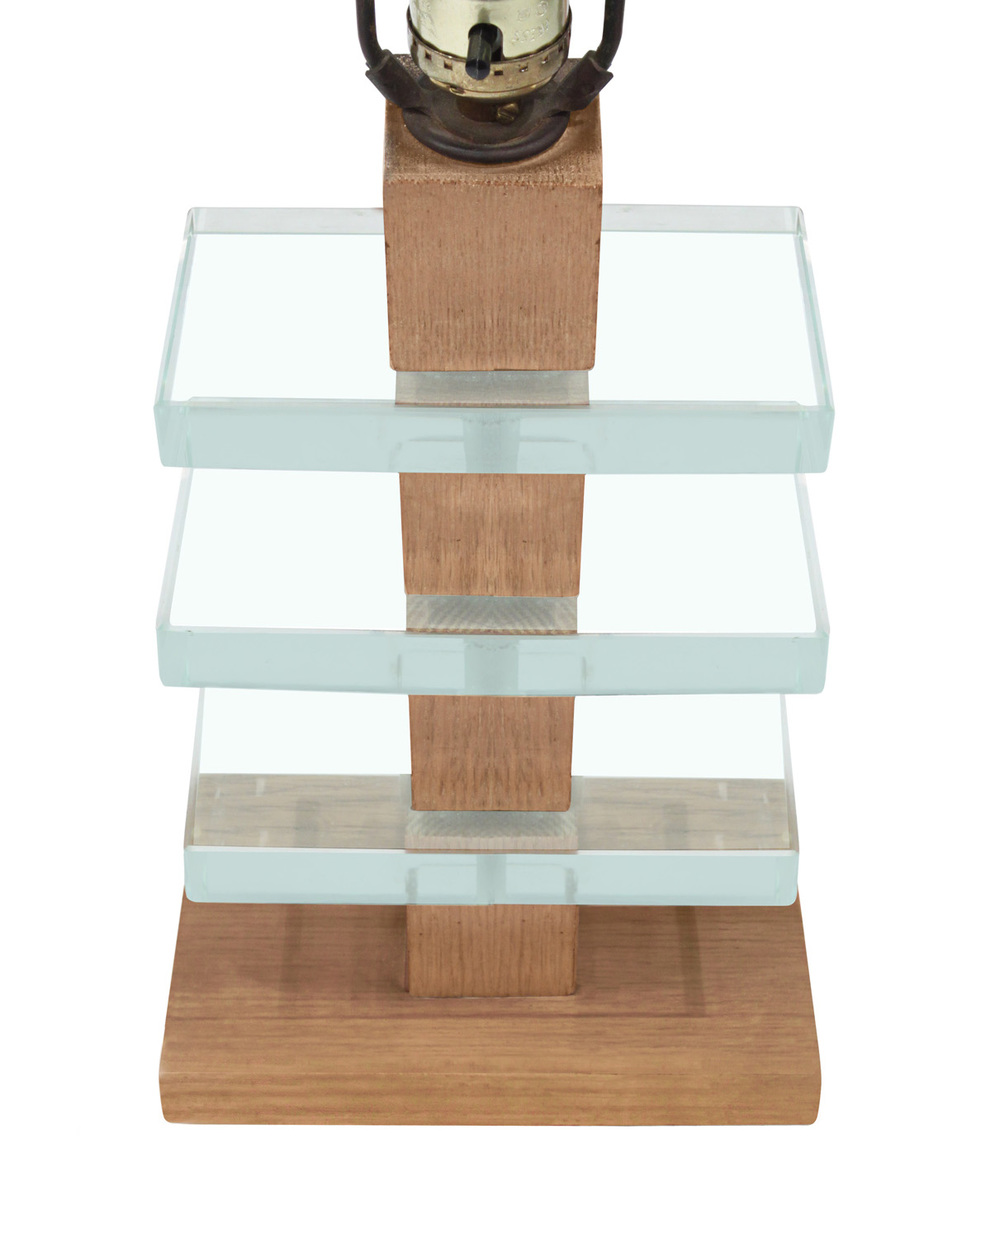 Modernage 65 attr glass+wood tablelamps333 detail2 hires.jpg